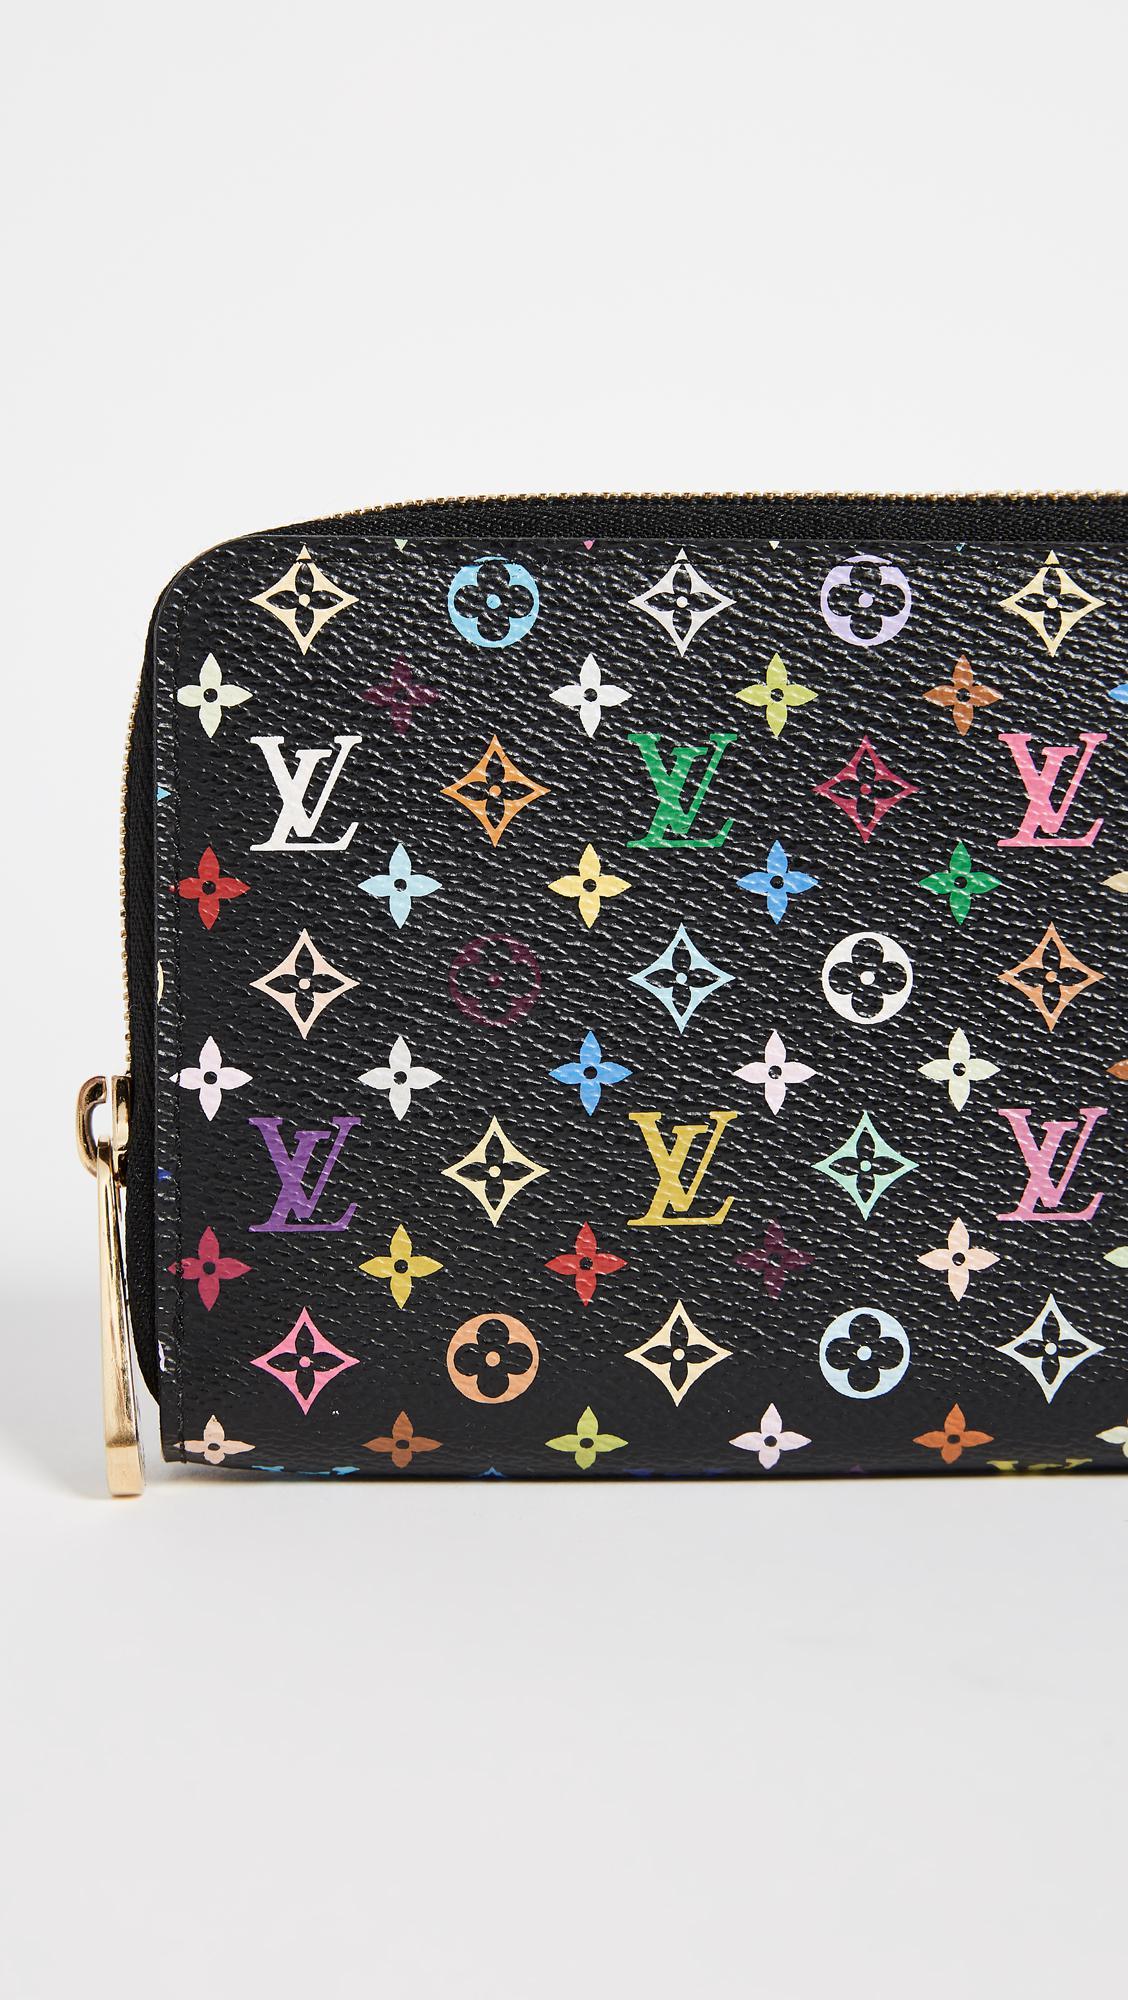 a1321ddf64a1 Lyst - What Goes Around Comes Around Louis Vuitton Epi Zippy Wallet ...